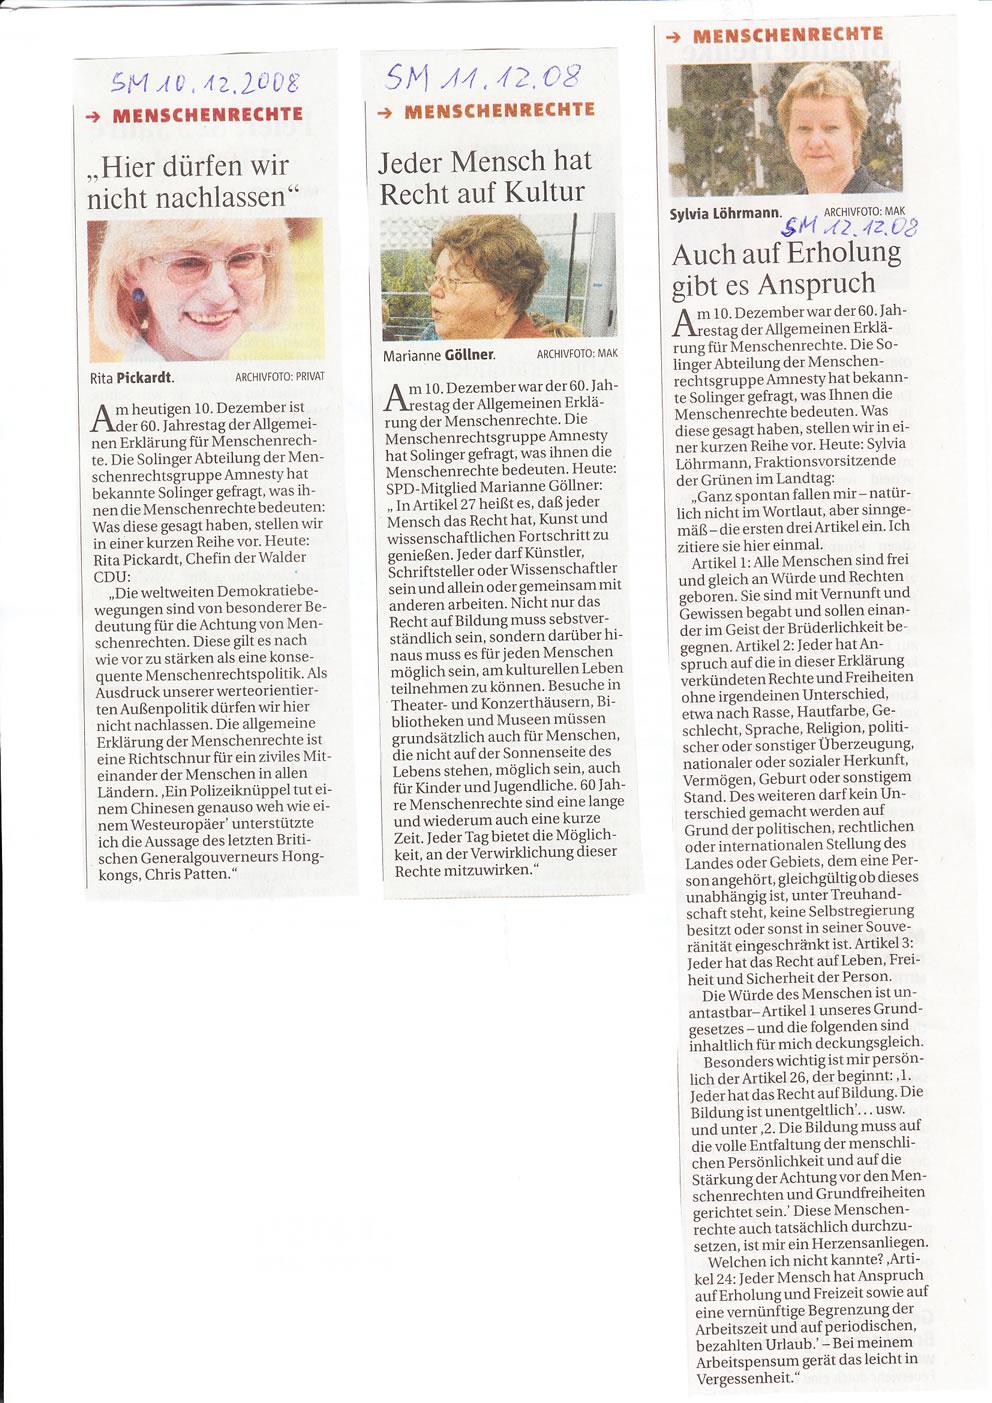 Solinger Morgenpost 12/08: Solinger Promis für Menschenrechte